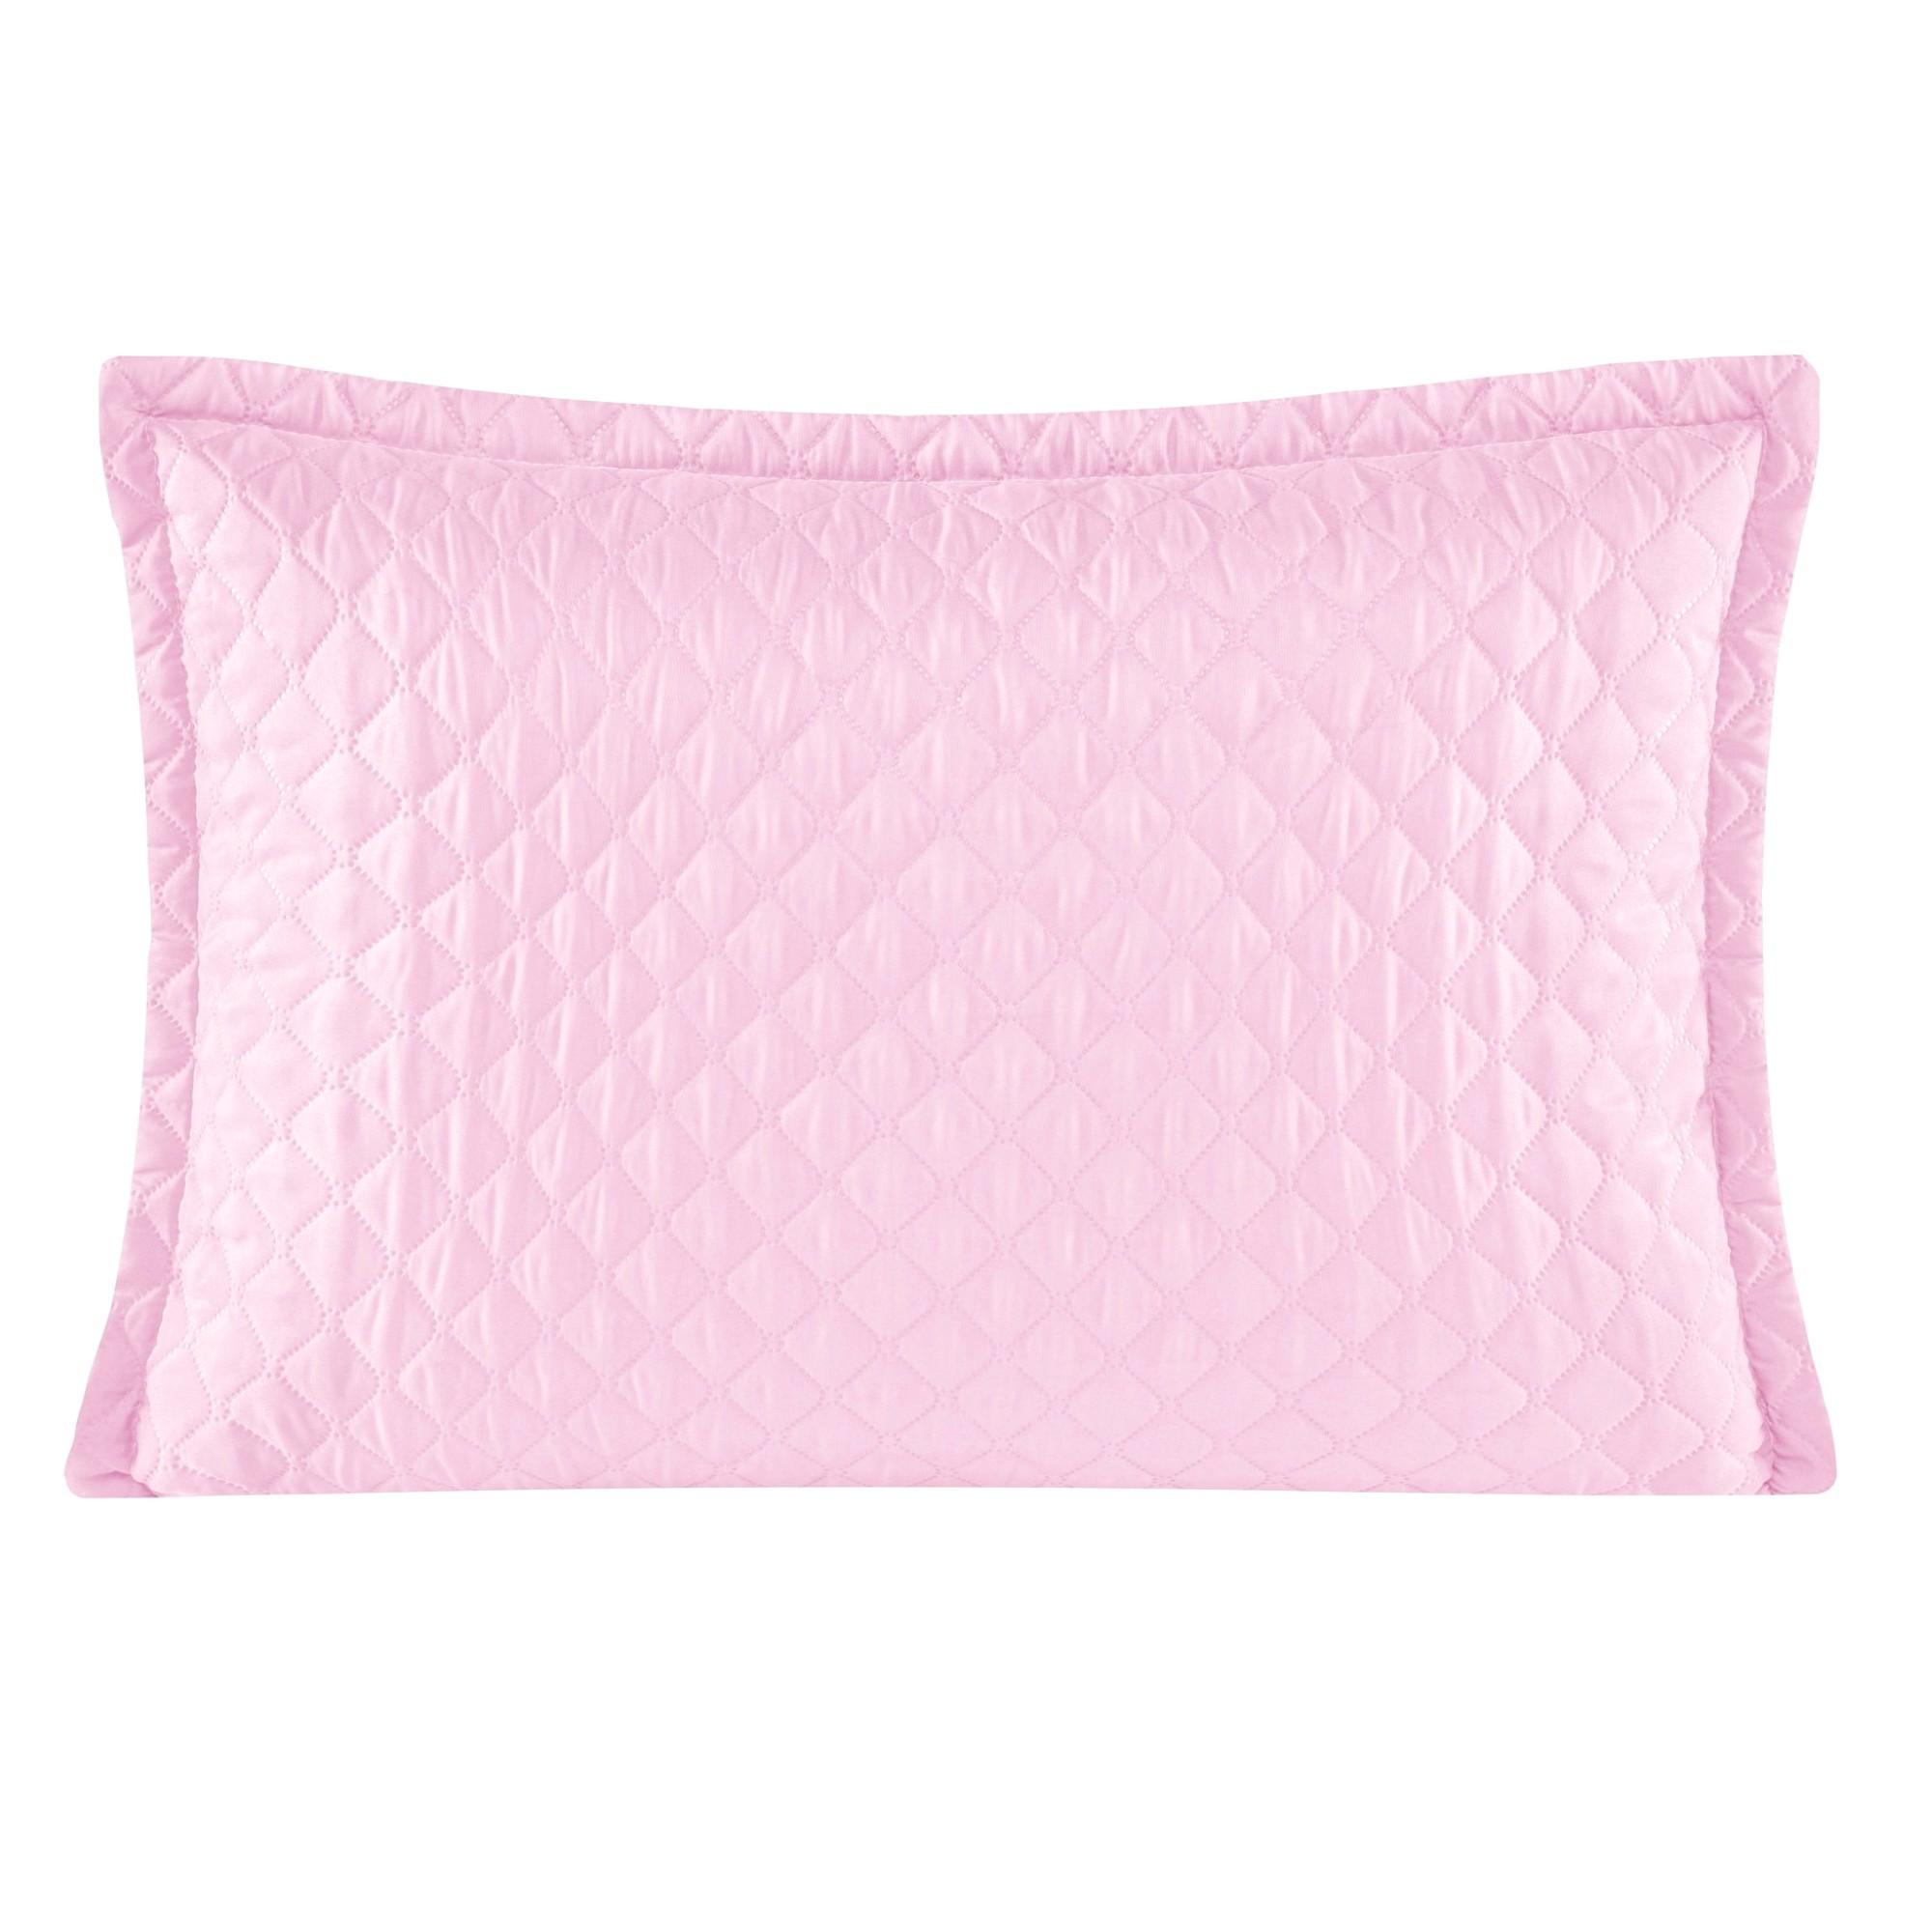 Porta Travesseiro 50 x 70 cm Delicata Rosa - Yohana